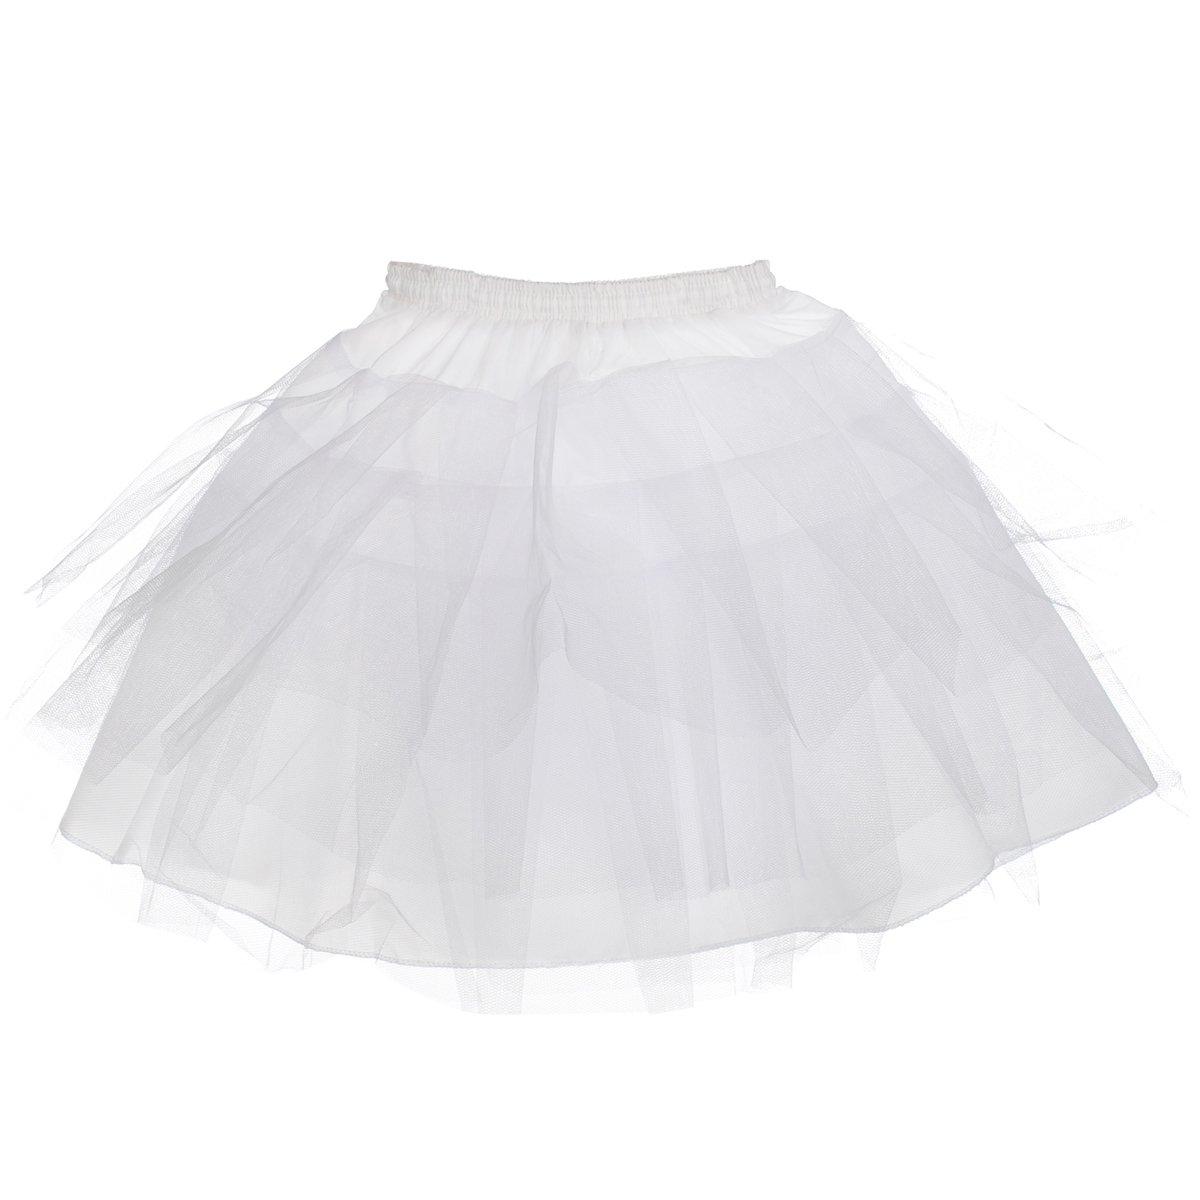 AW Girls Tulle Petticoat Hoopless Kids Soft Half Slip Tutu Skirt Dress AWUSQC130U061